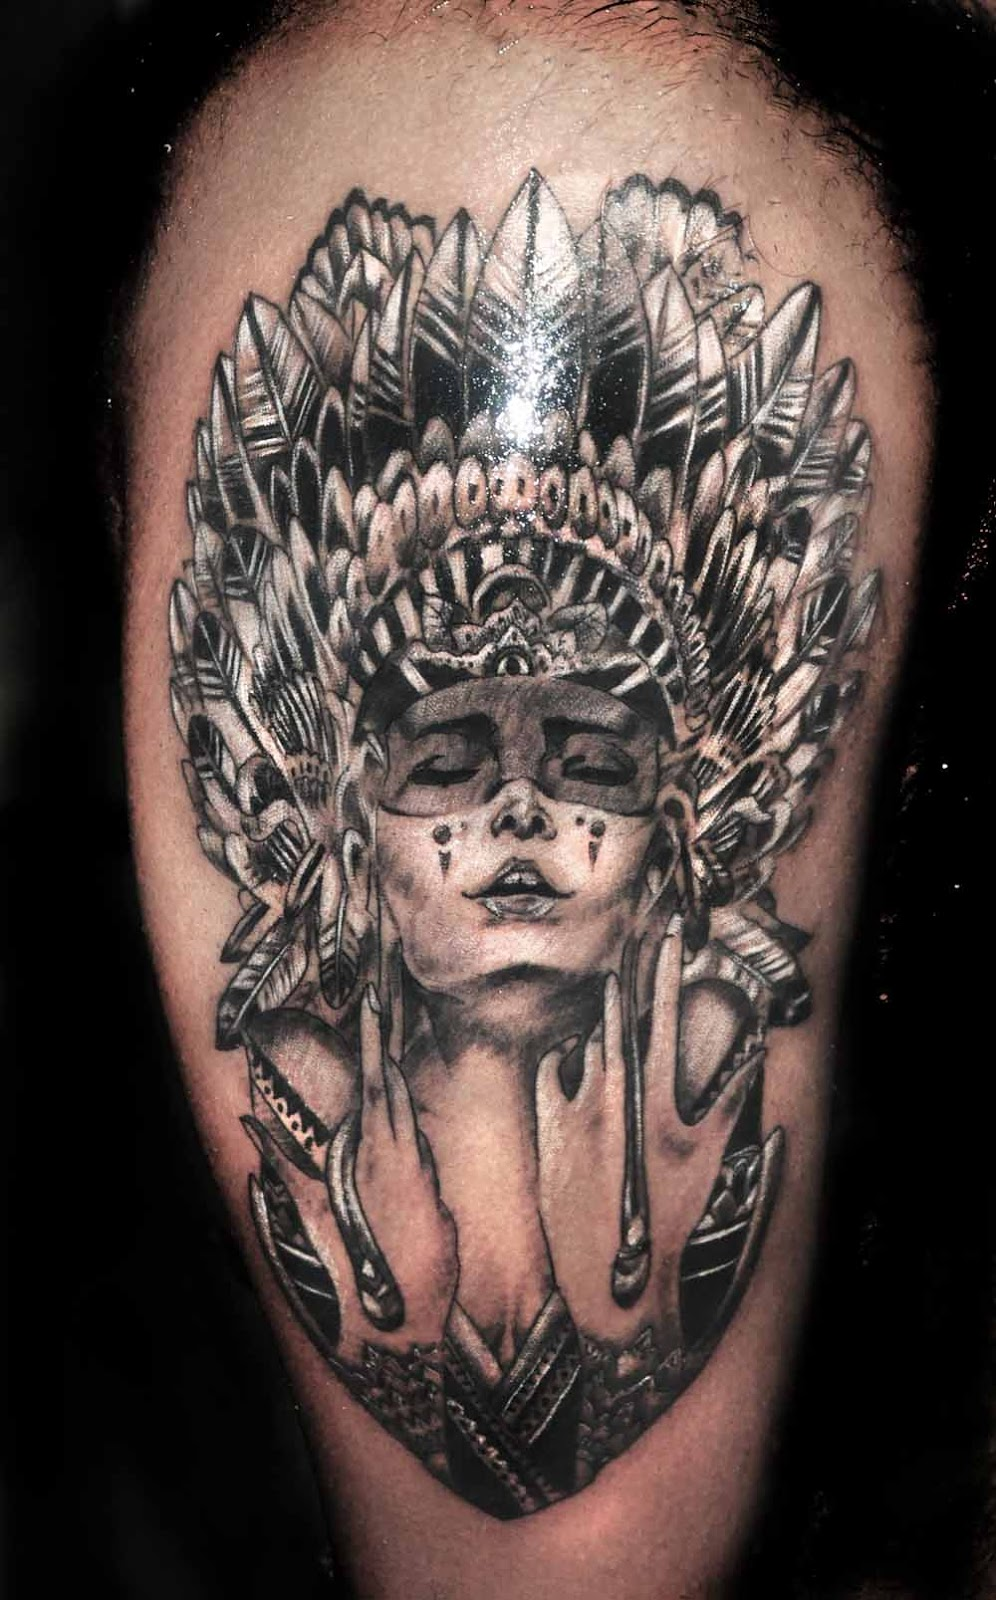 Lizards Skin Tattoos Modern Girl With Red Indian Head Gear